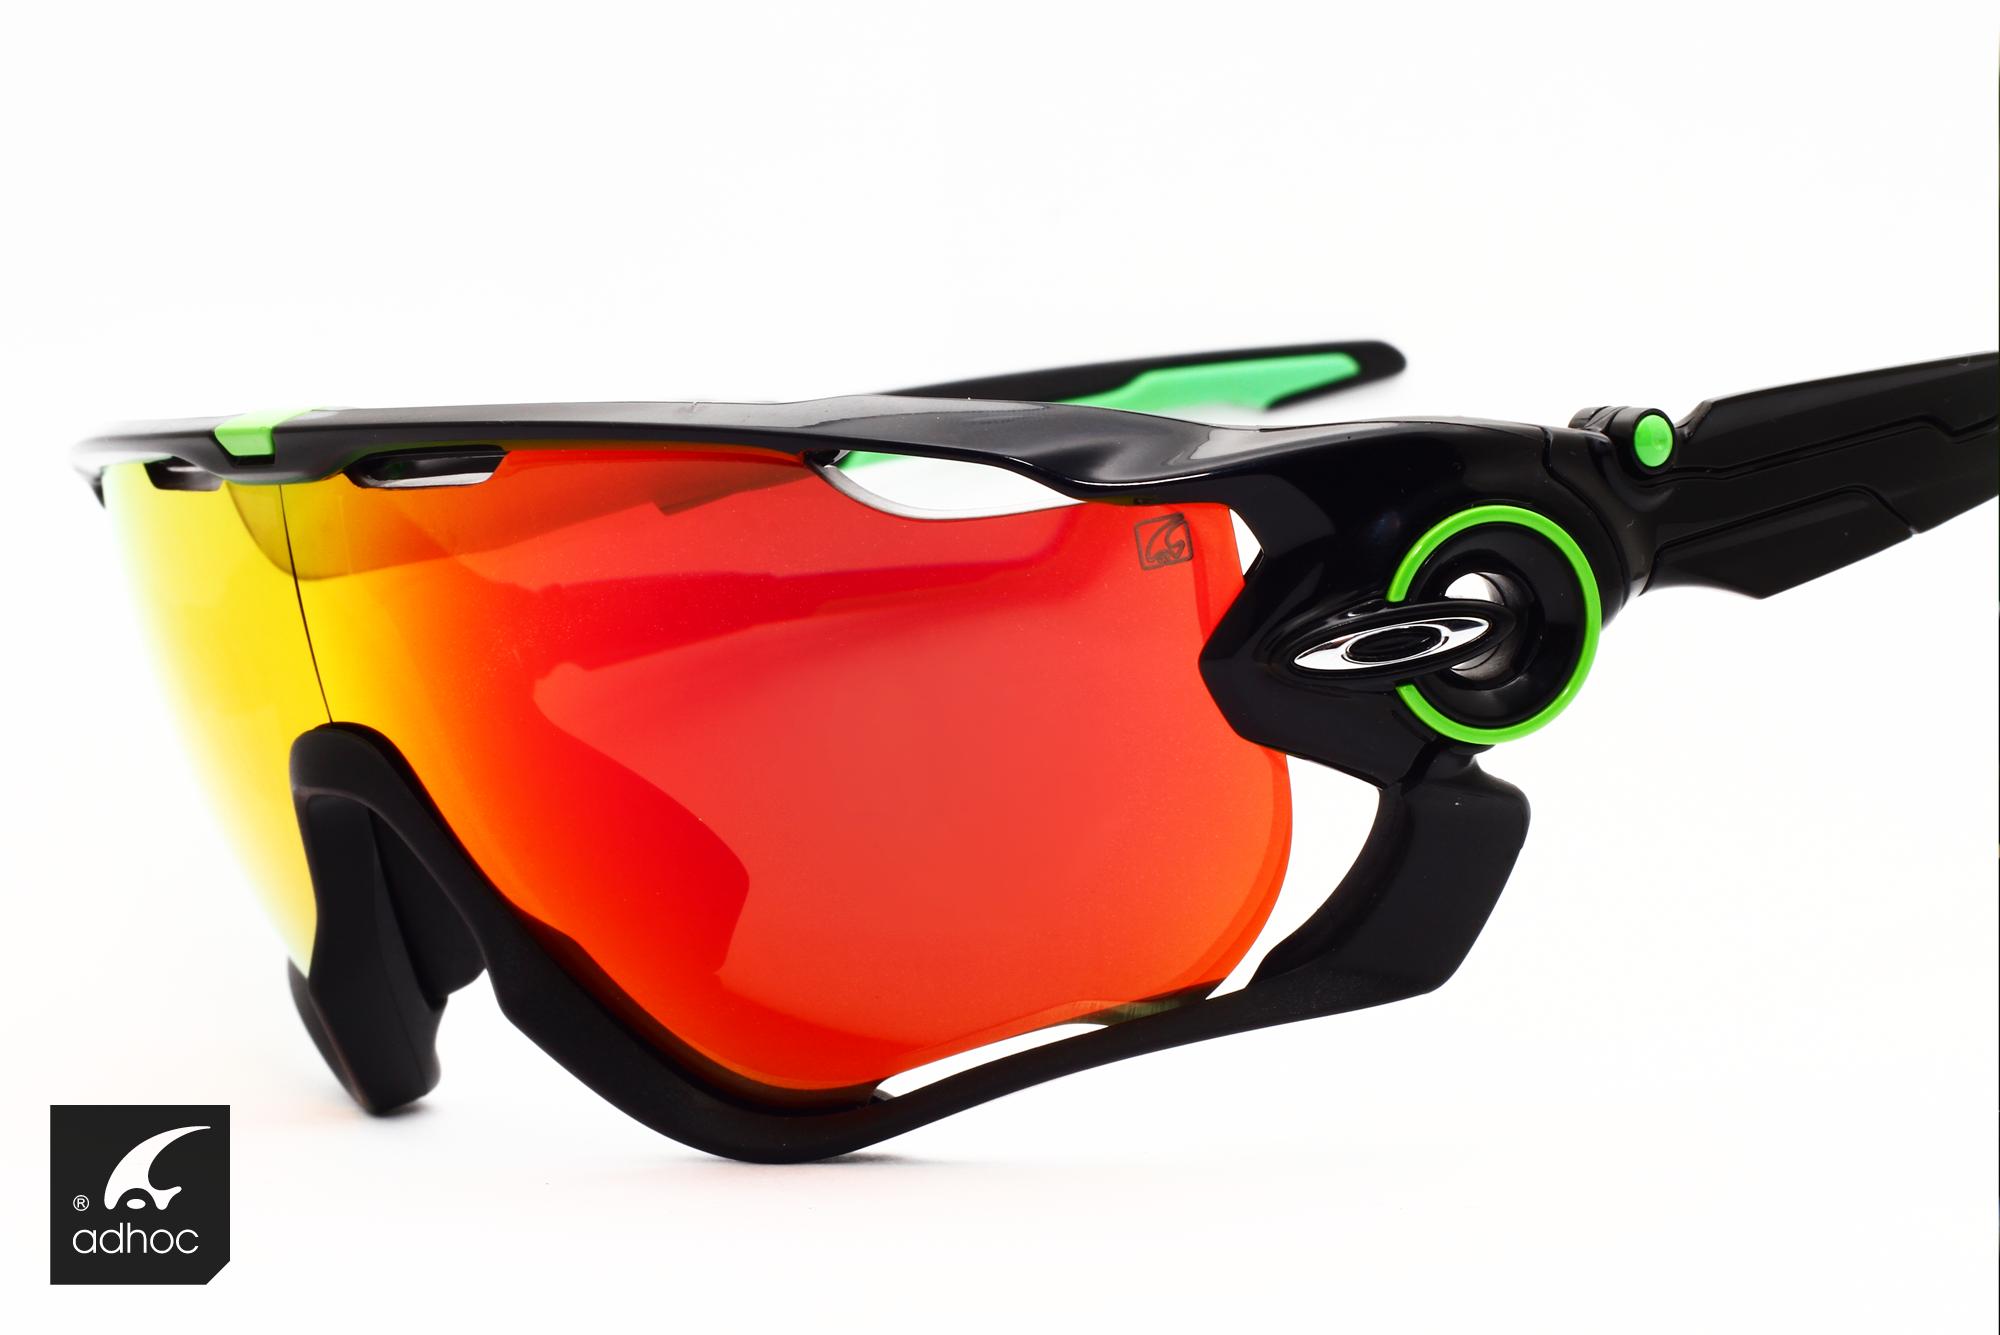 Oakley jawbreaker sport eyewear with adhoc RX DSM optic